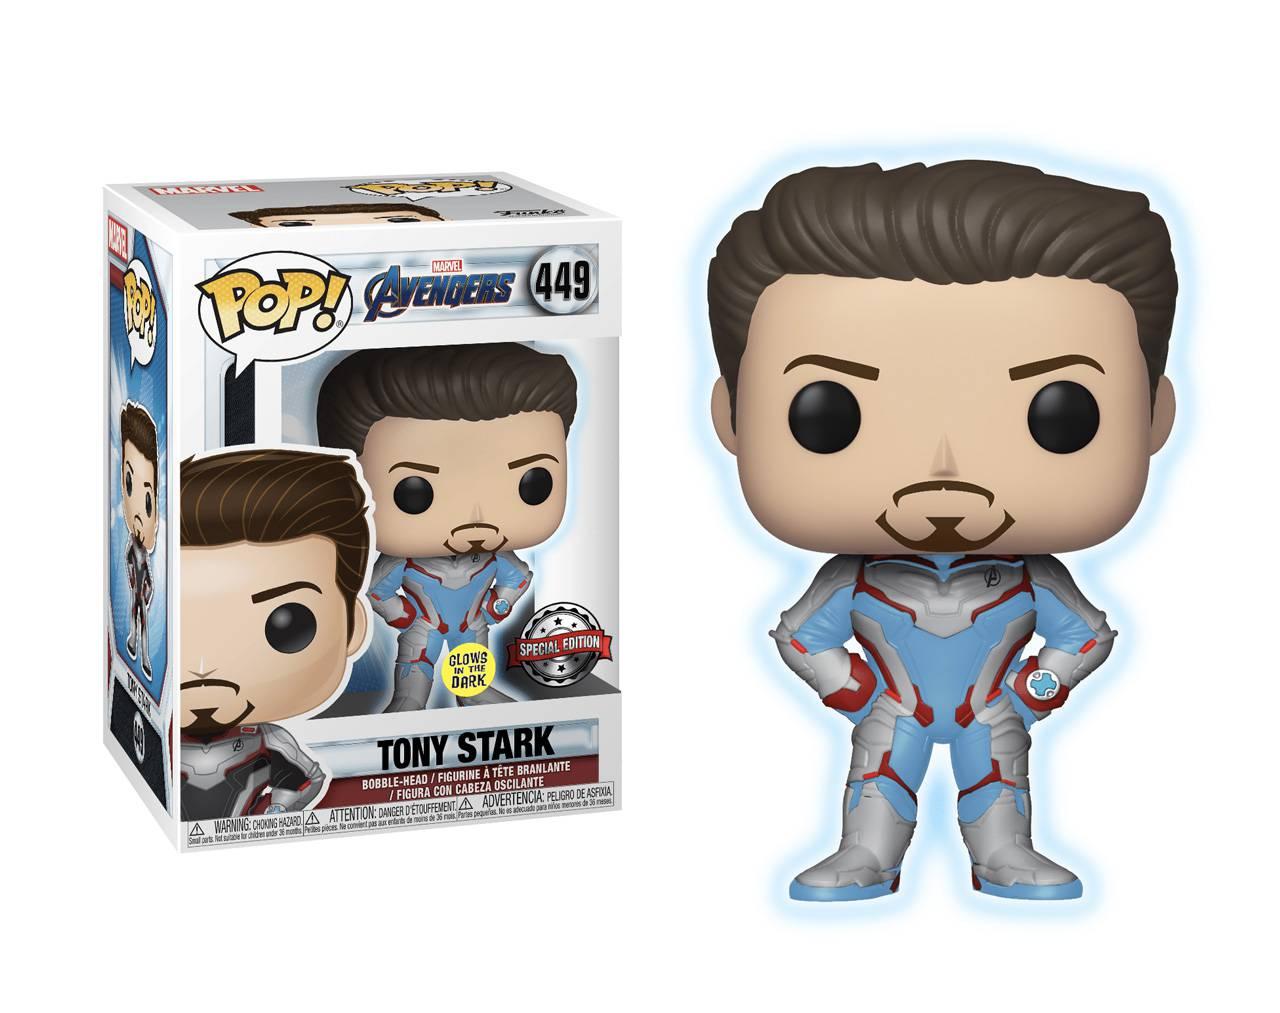 Tony Stark (GITD) Pop! Vinyl